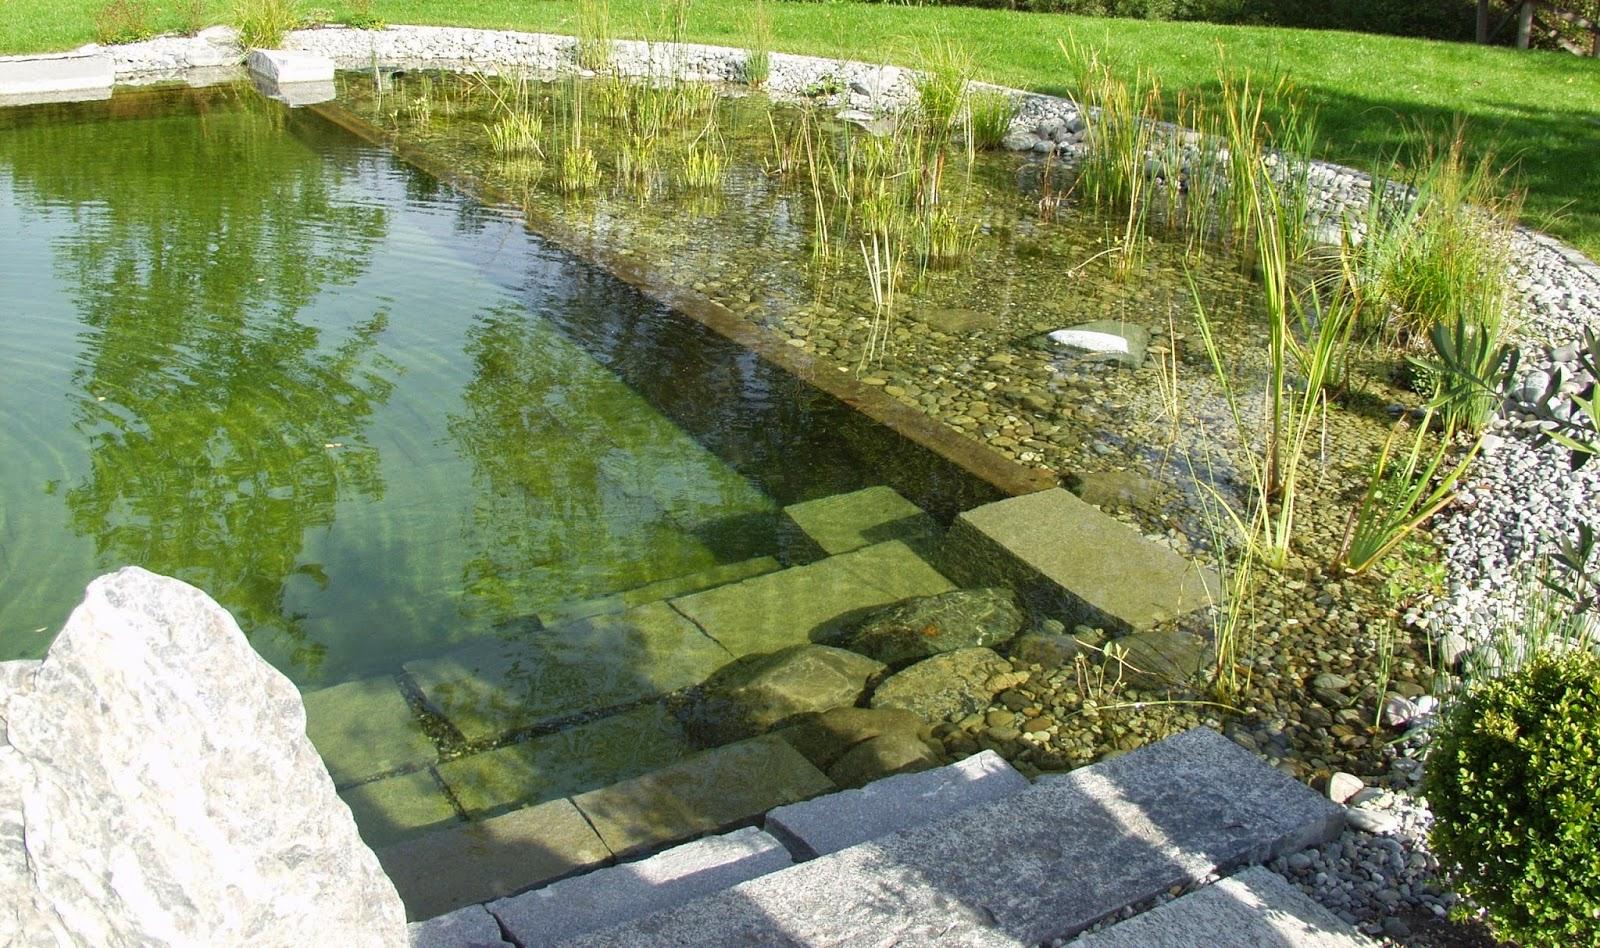 Te invito a leer piscinas naturales for Albercas naturales